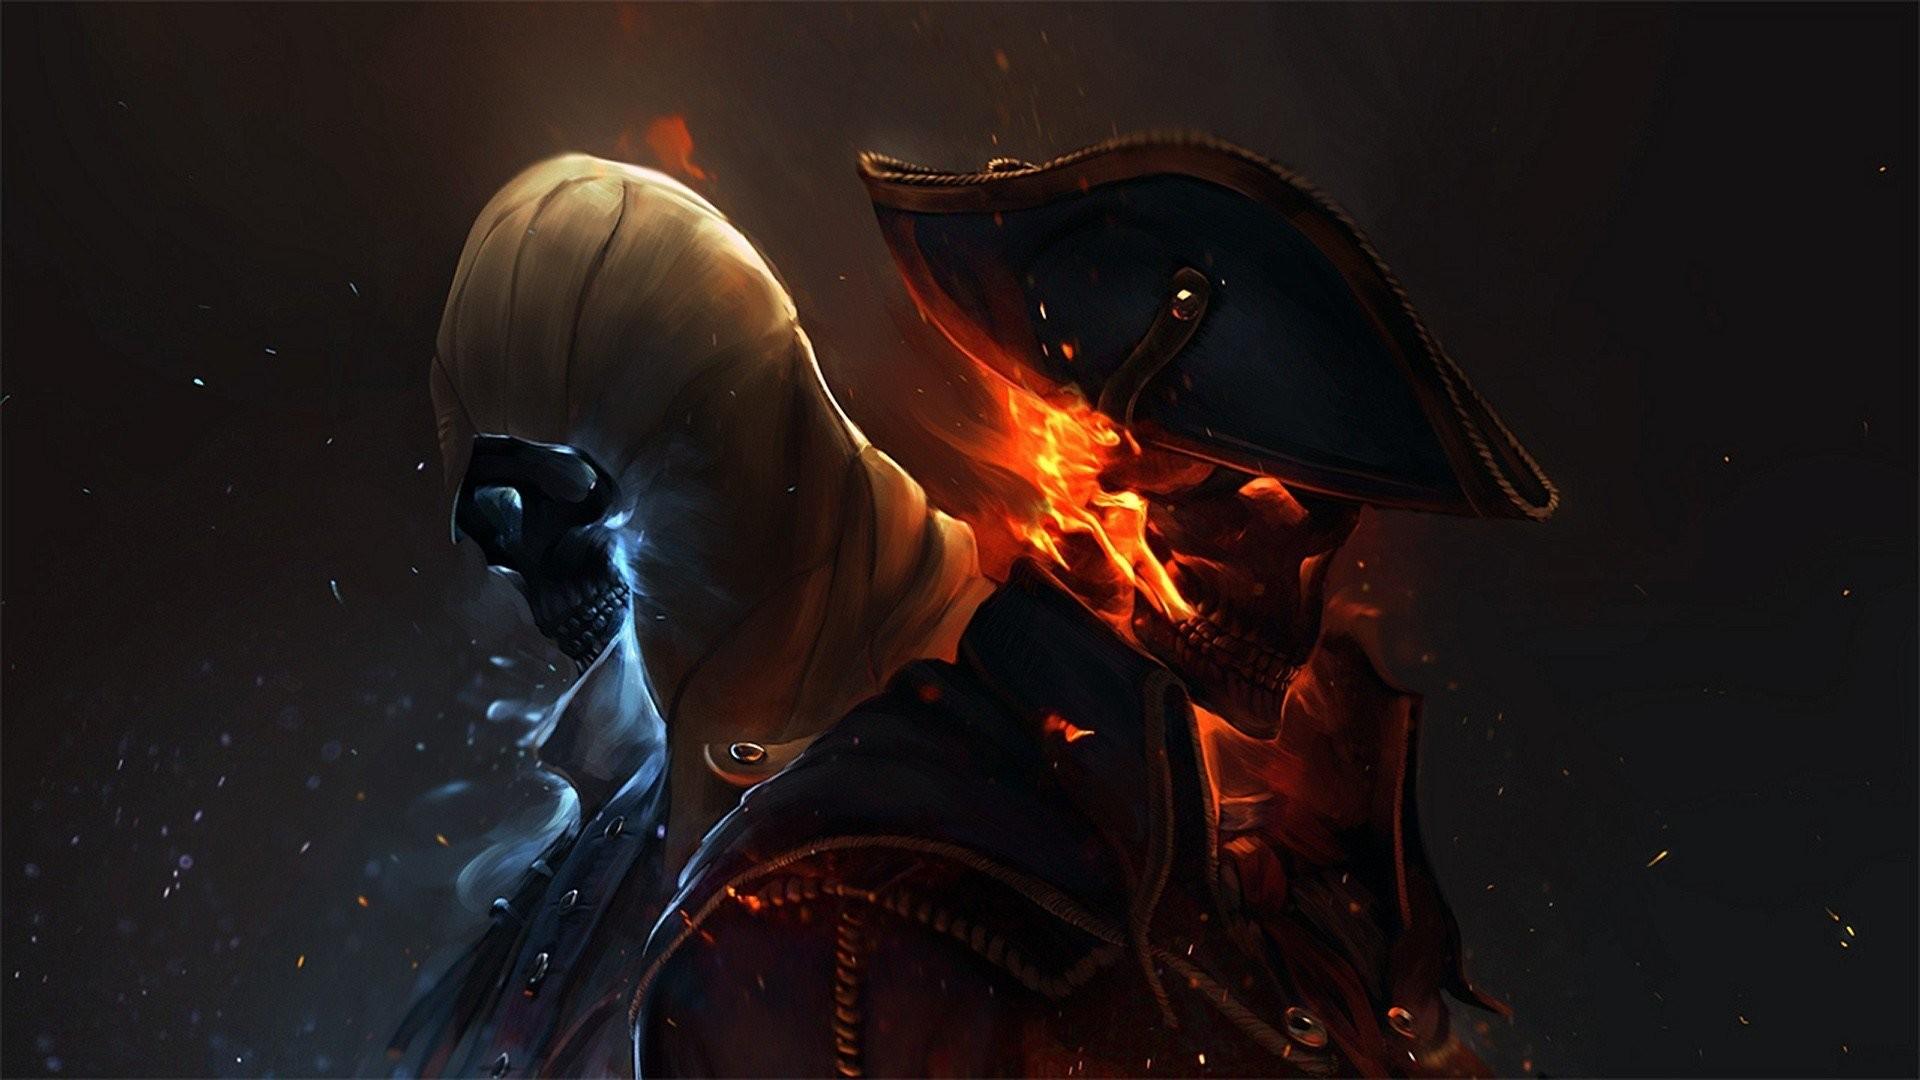 American Revolution Artwork Assassins Creed 3 Capes Connor Kenway Flames  Snow Ubisoft Uniforms War